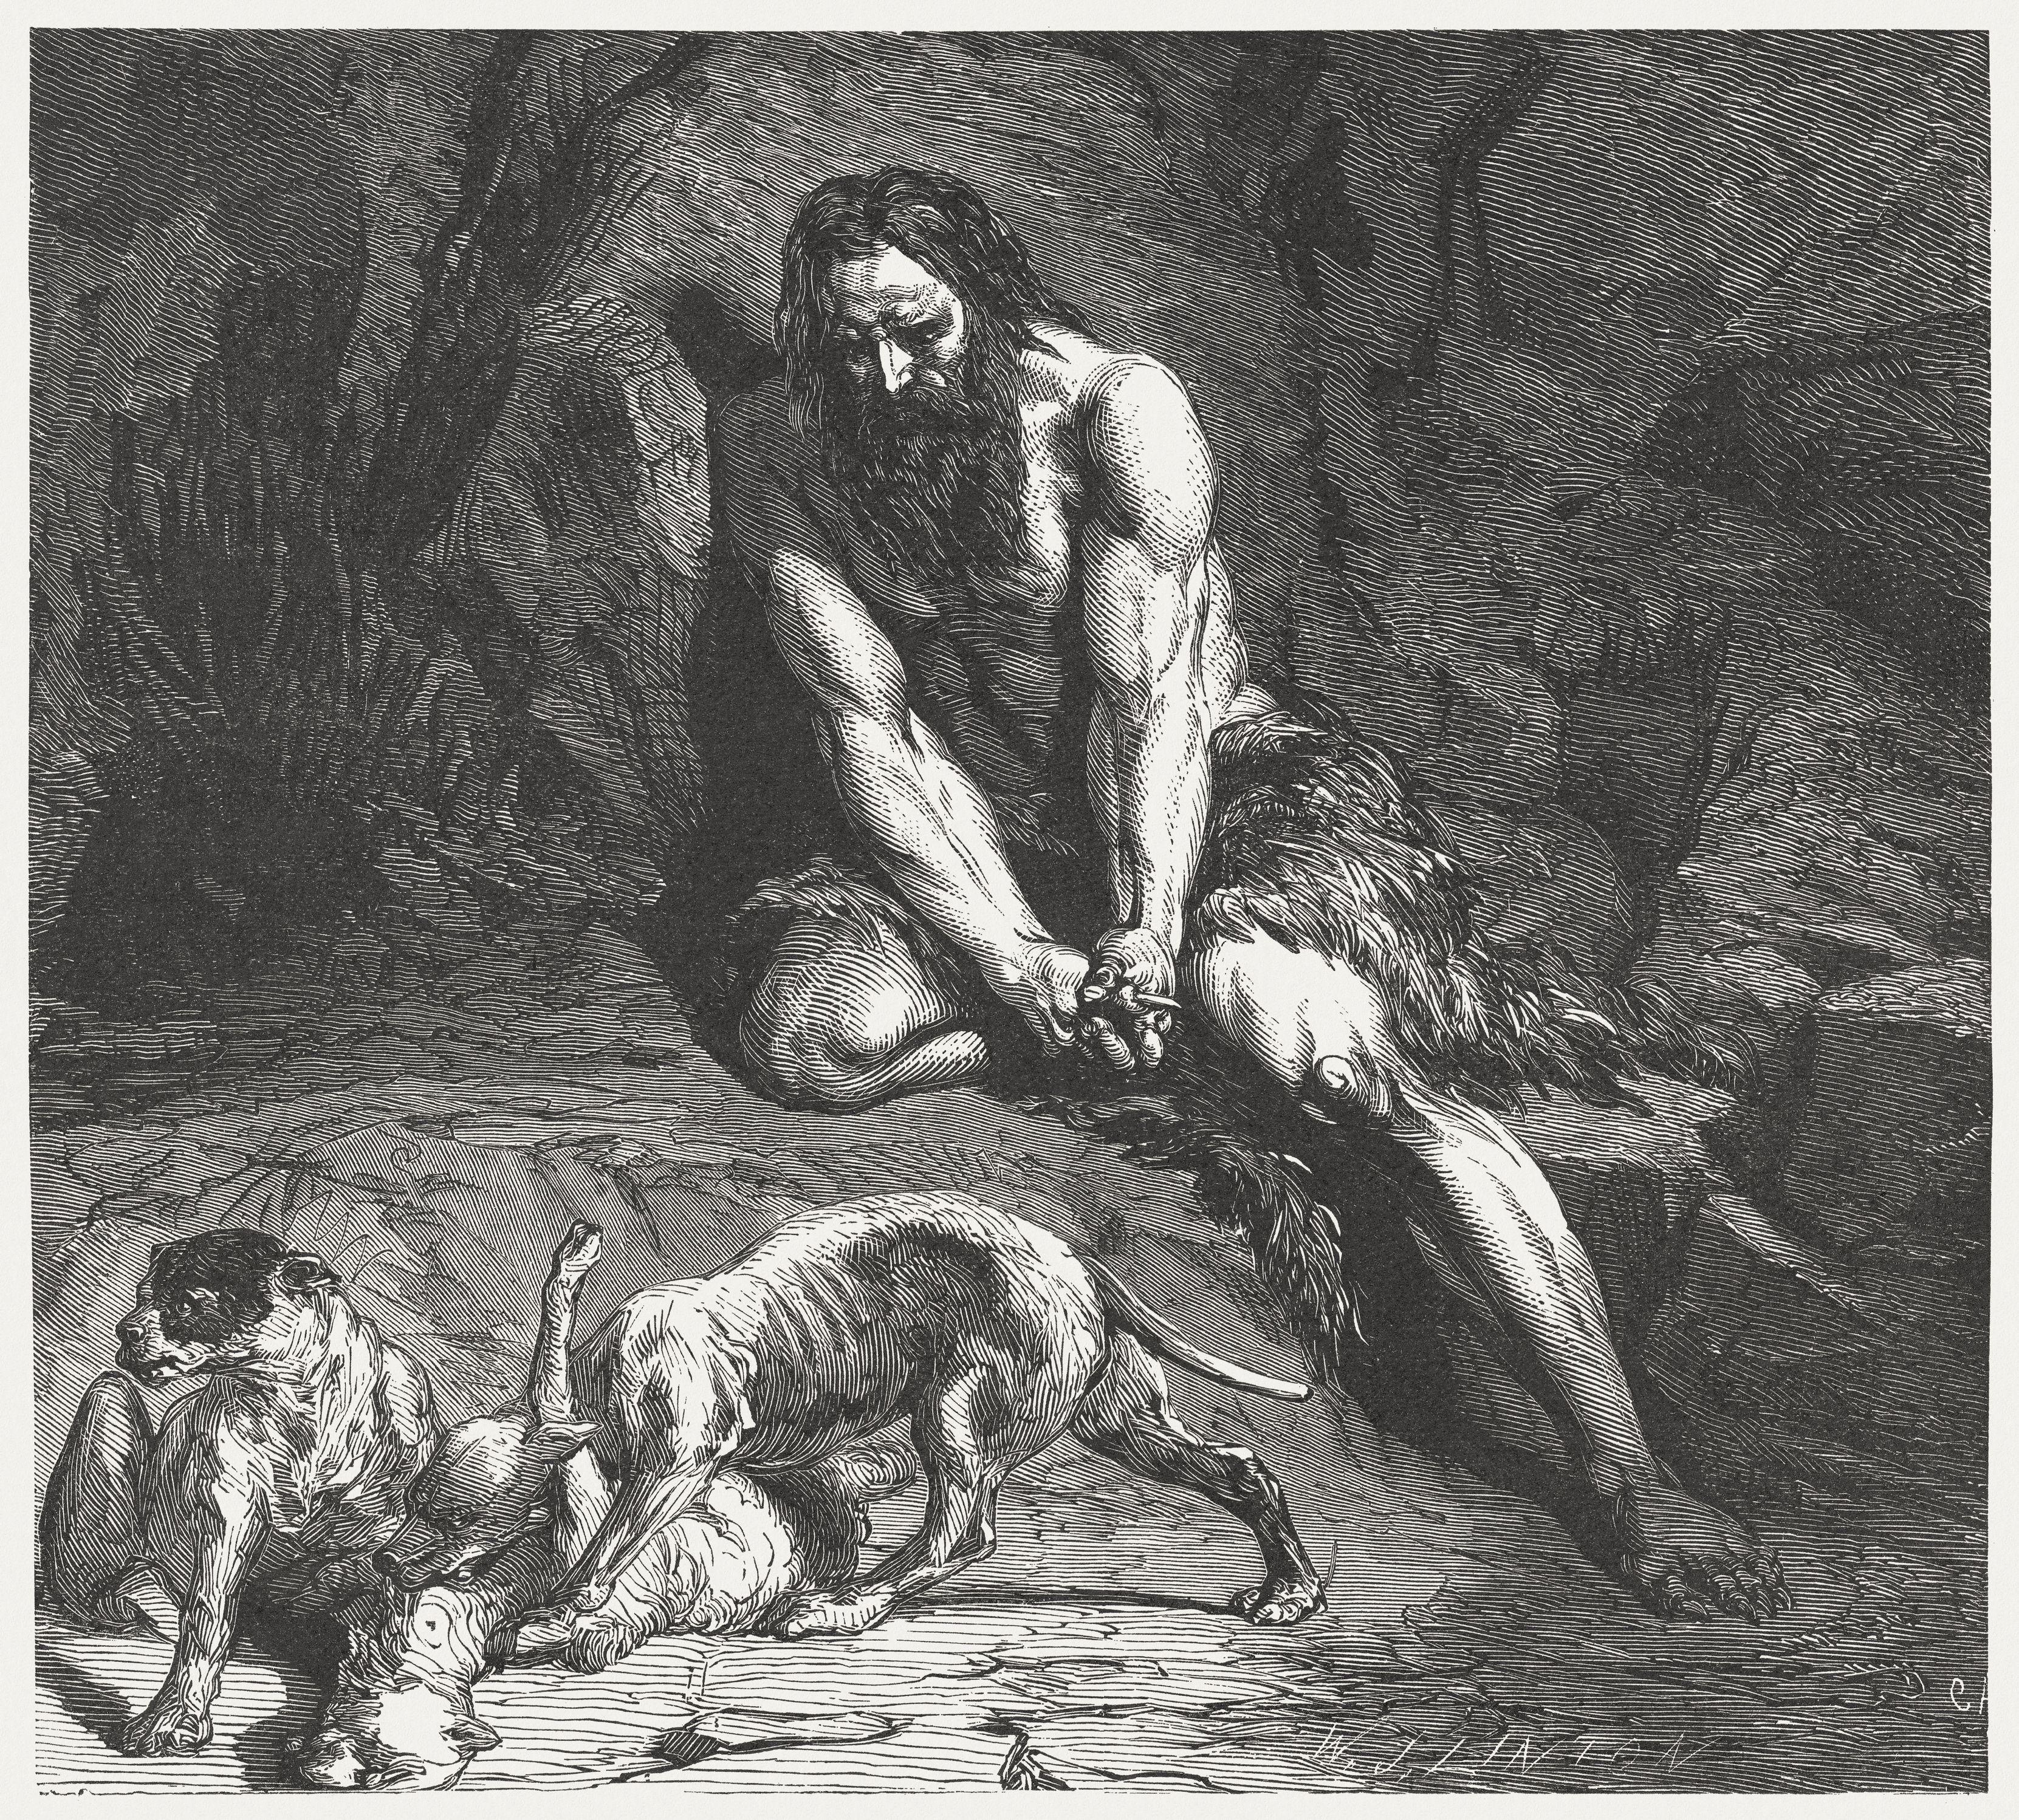 Nebuchadnezzar's dream comes true (Daniel 4,30), wood engraving, published 1886